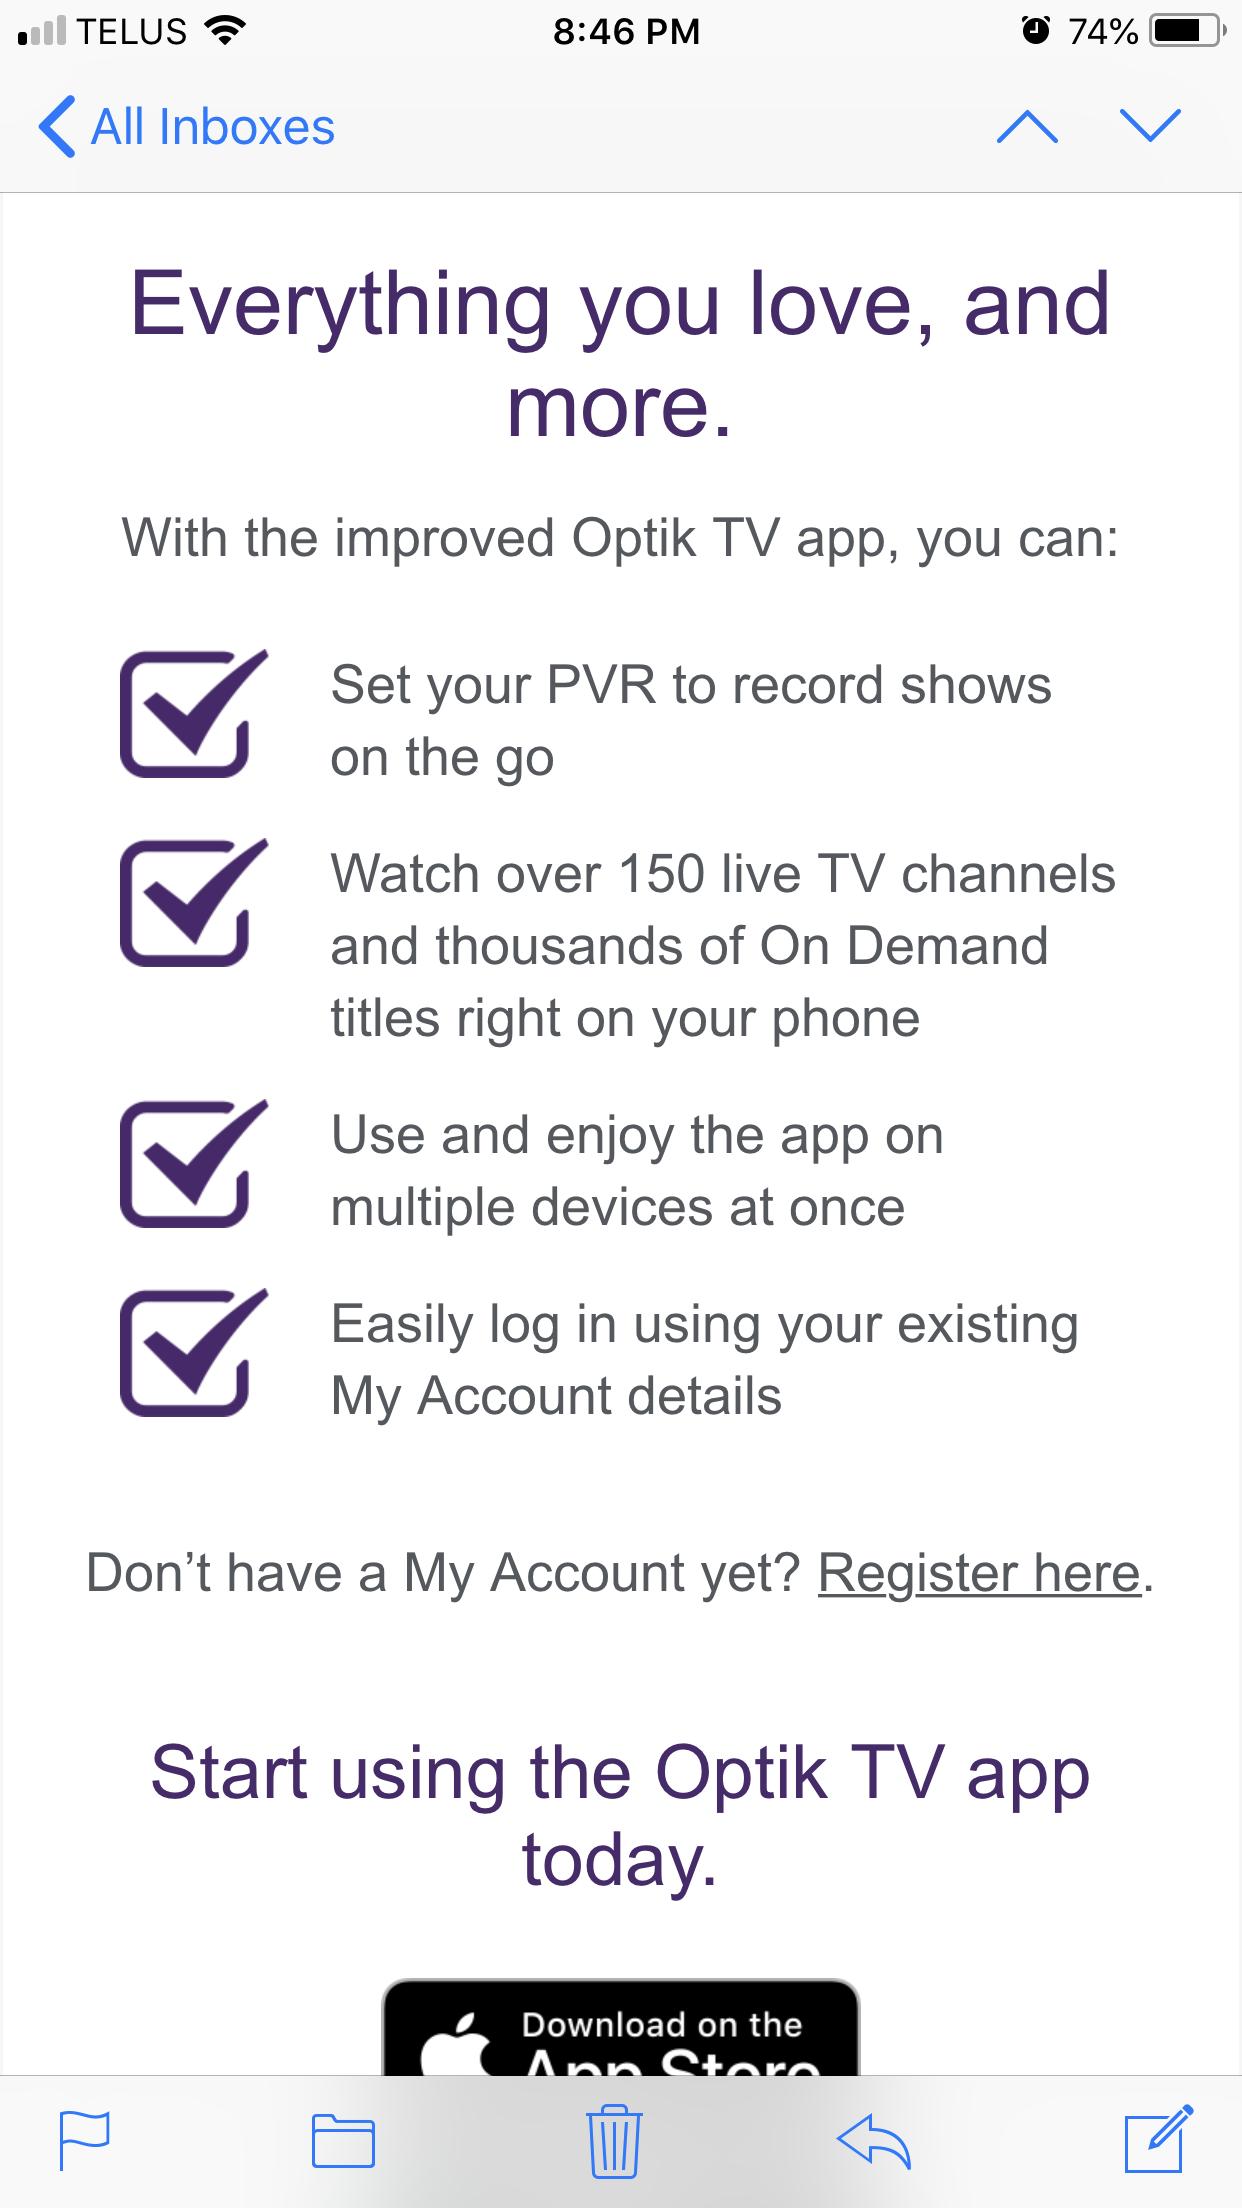 Bring back the optik smart remote app - TELUS Neighbourhood